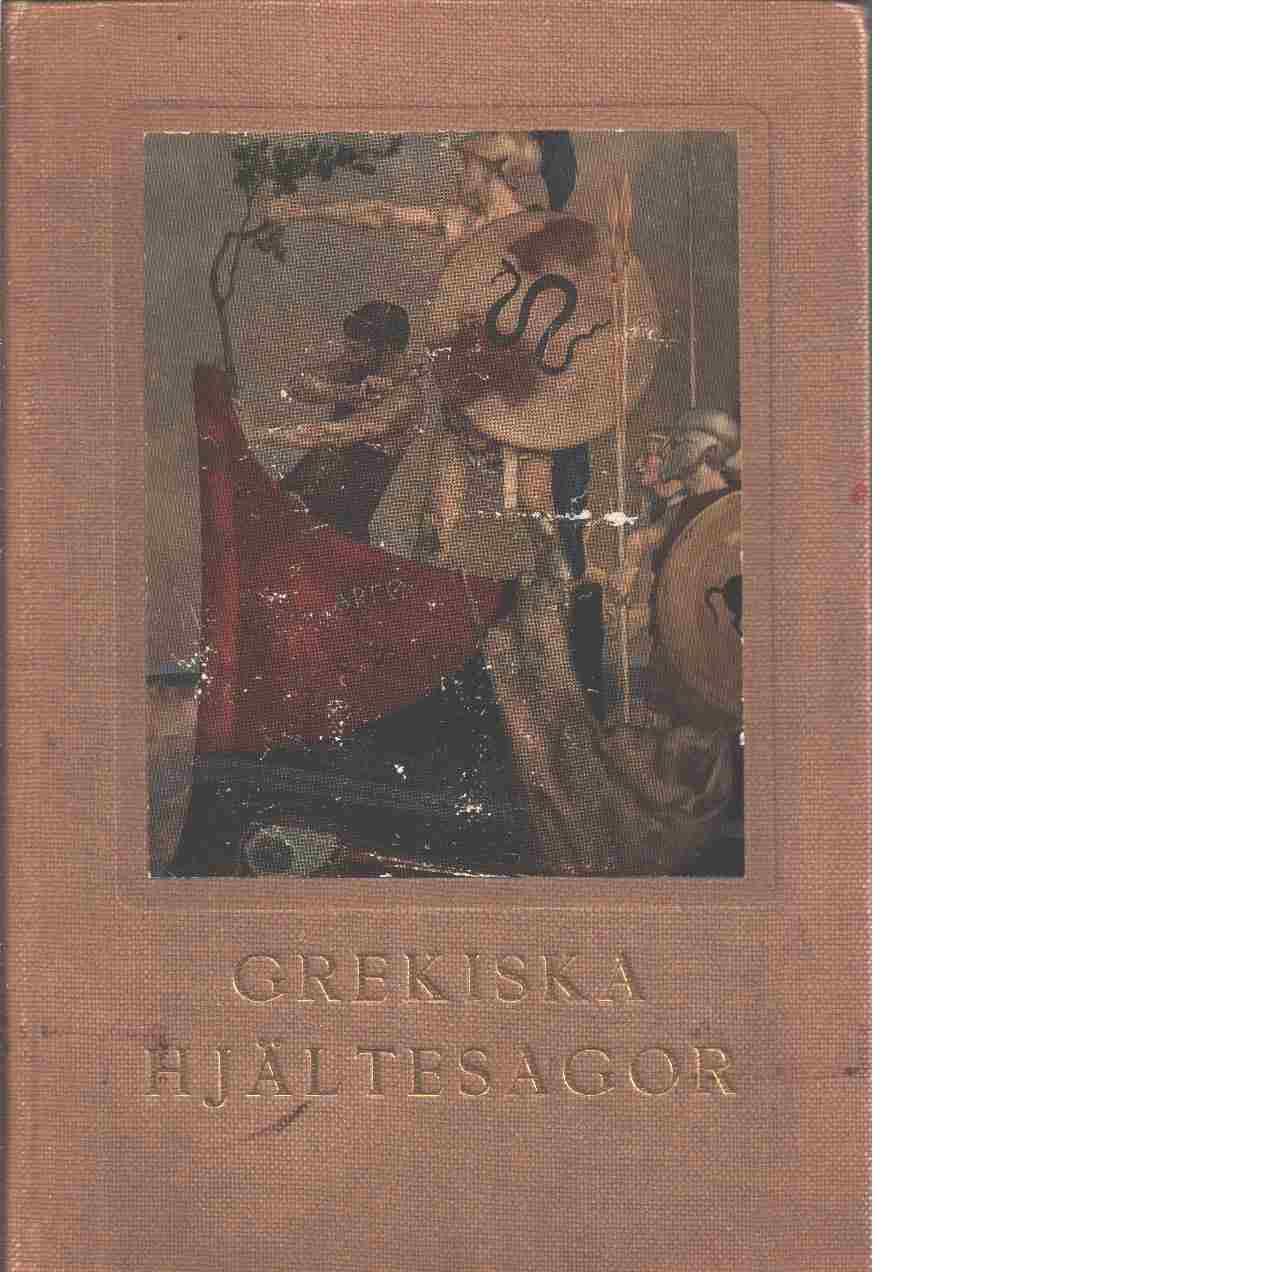 Grekiska hjältesagor - Kingsley, Charles